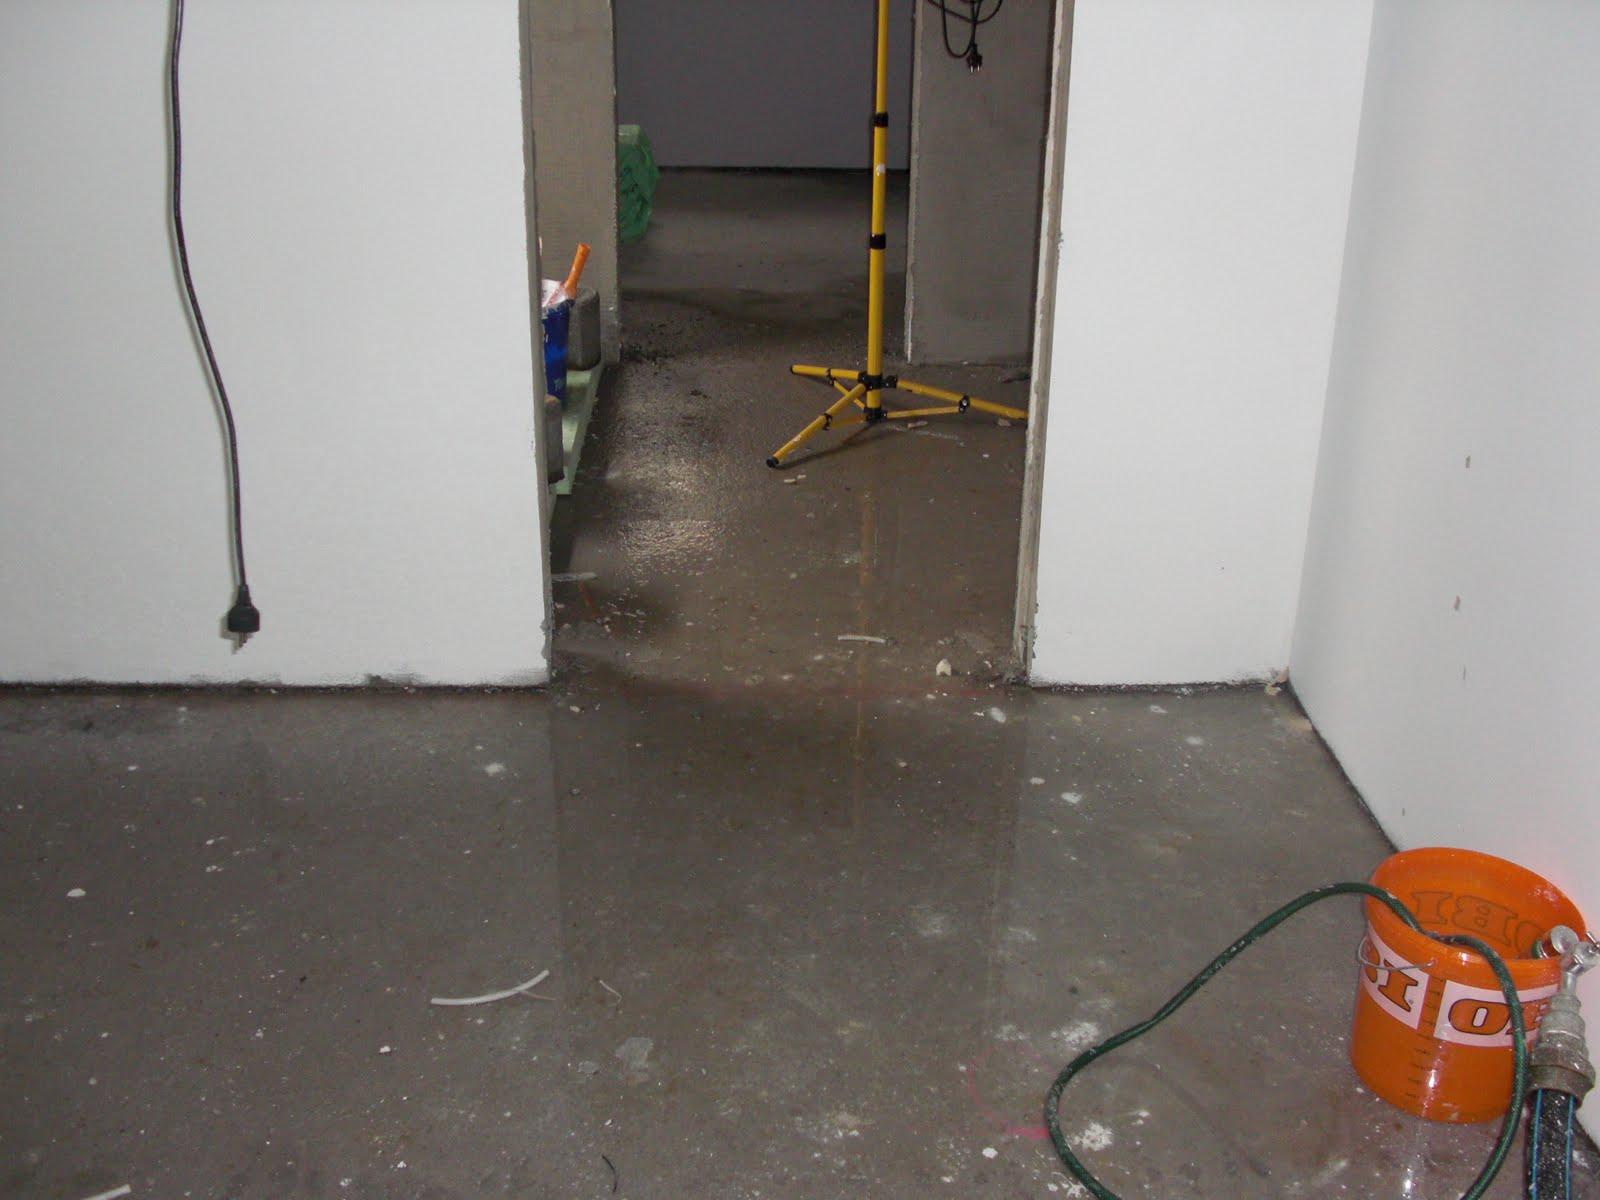 Fingerhausbau Enzkreis: Verkabelung Garage Teil I